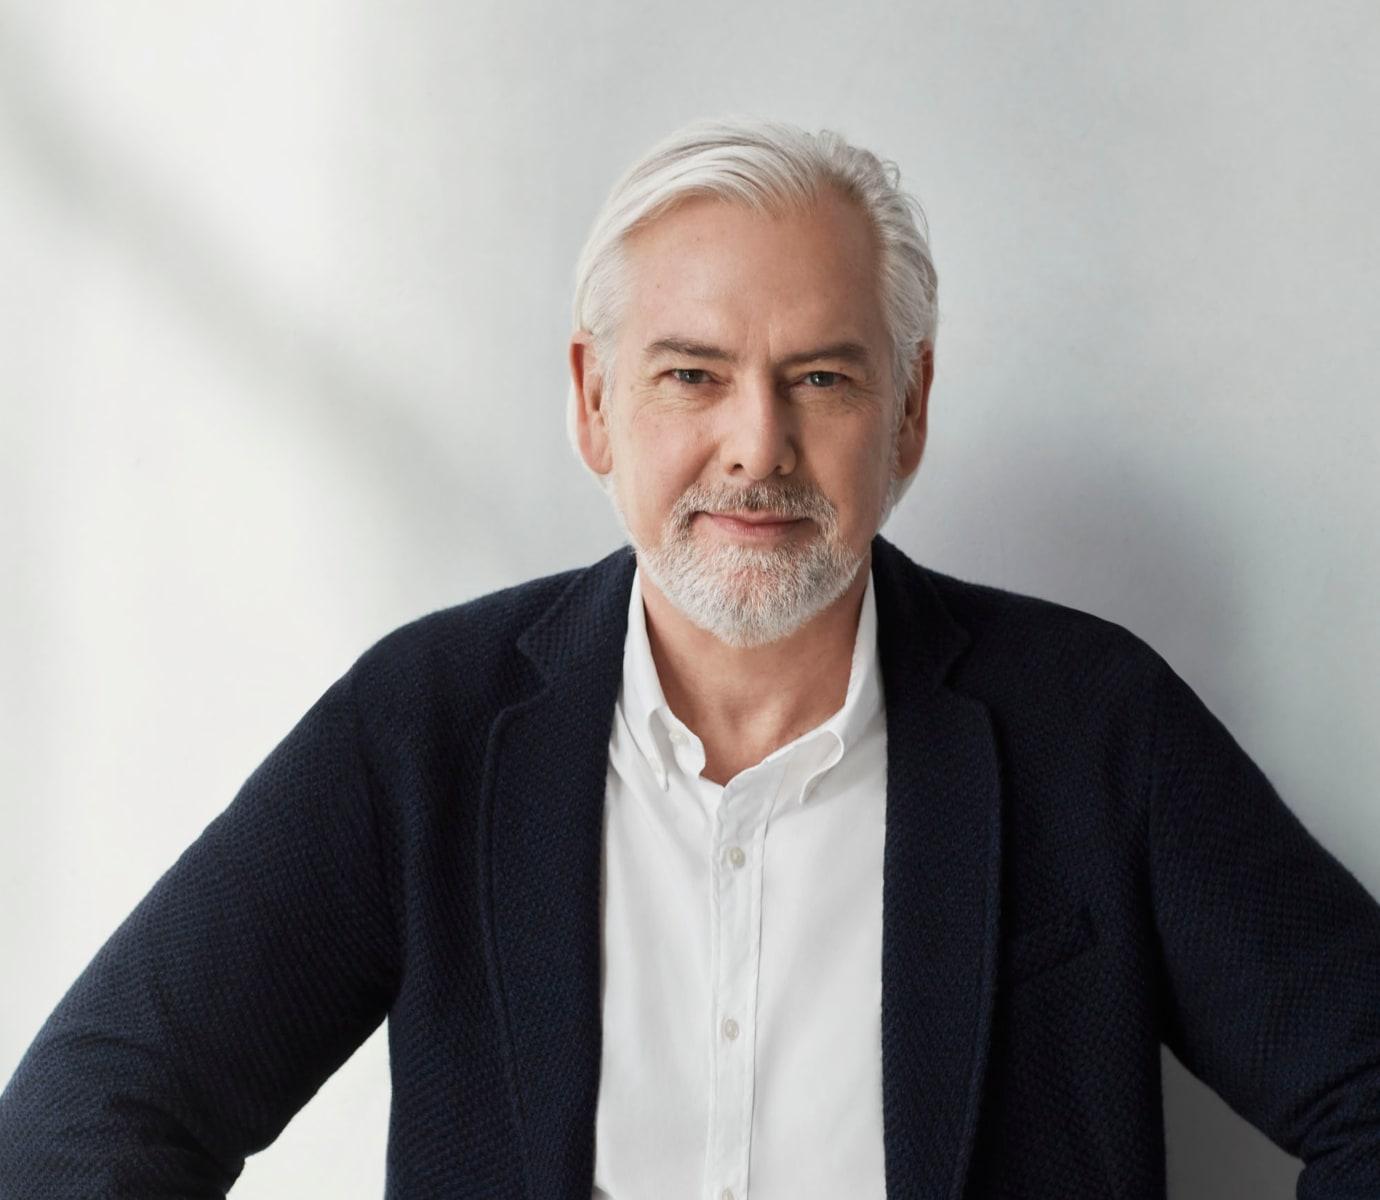 Jacek Olczak, CEO of PMI